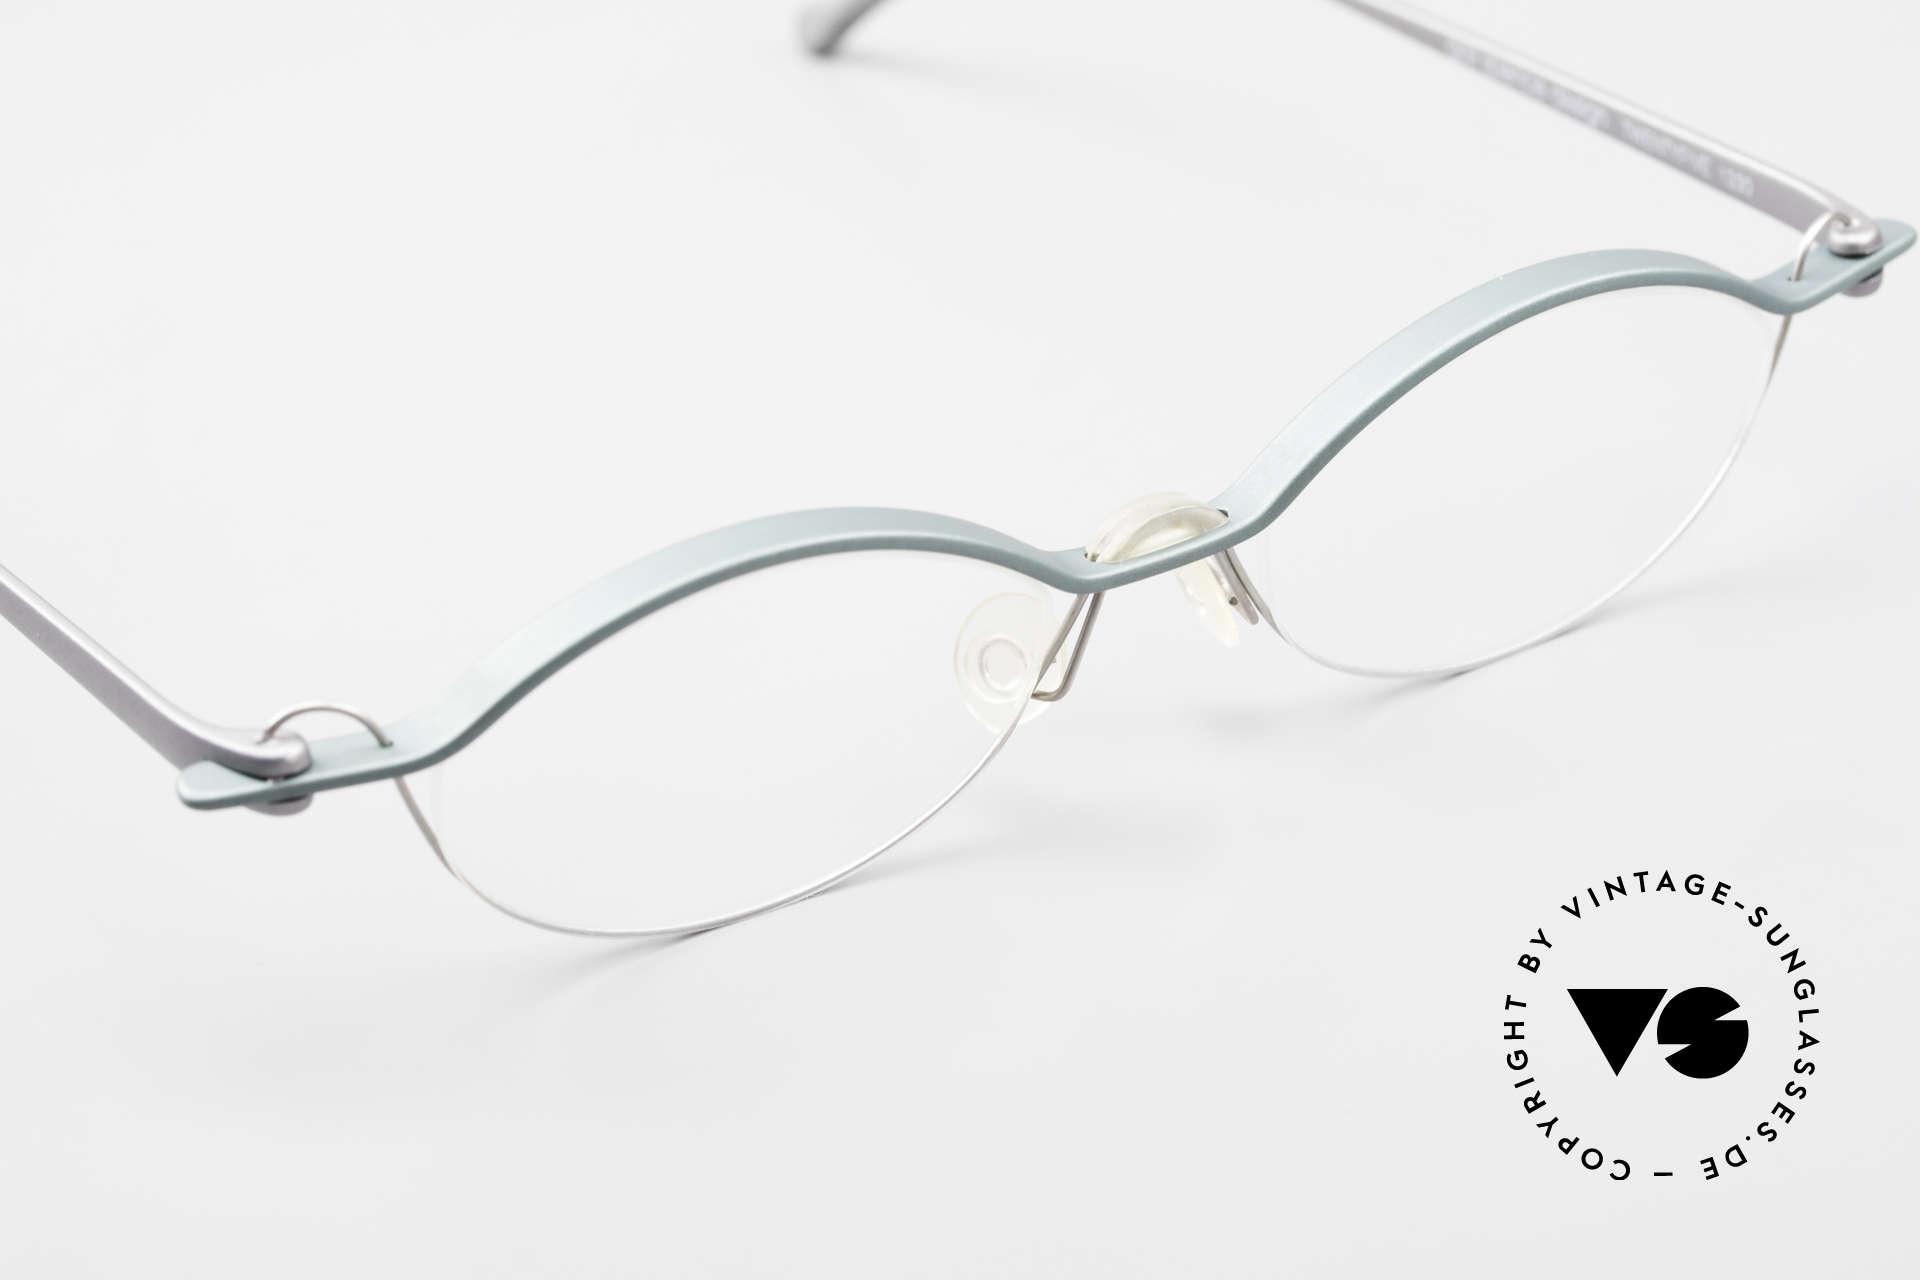 ProDesign No25 Gail Spence Aluminium Frame, unworn (like all our rare vintage ProDesign eyewear), Made for Men and Women